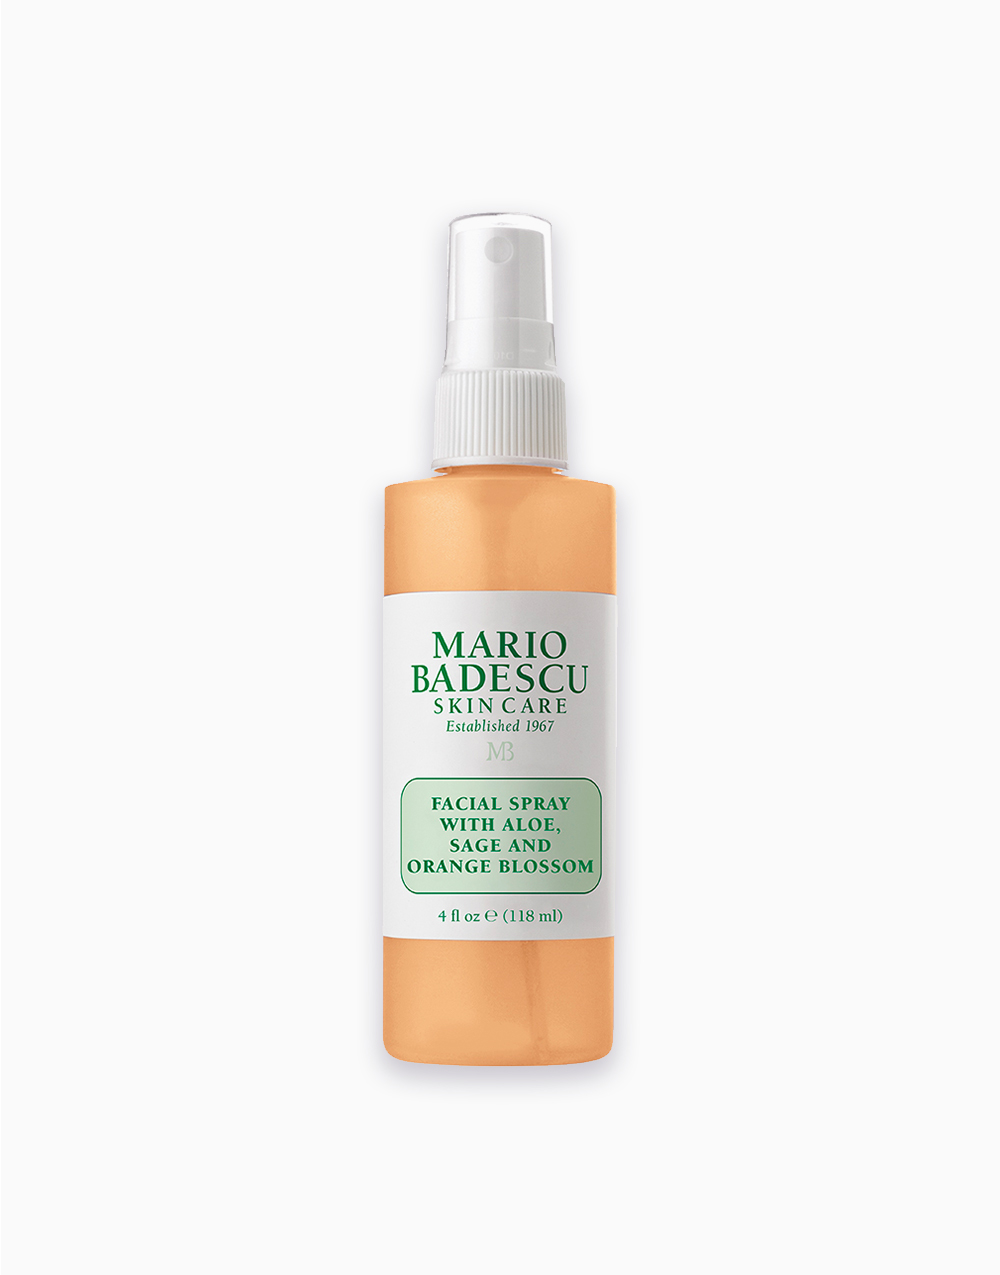 Facial Spray with Aloe, Sage and Orange Blossom (4oz) by Mario Badescu